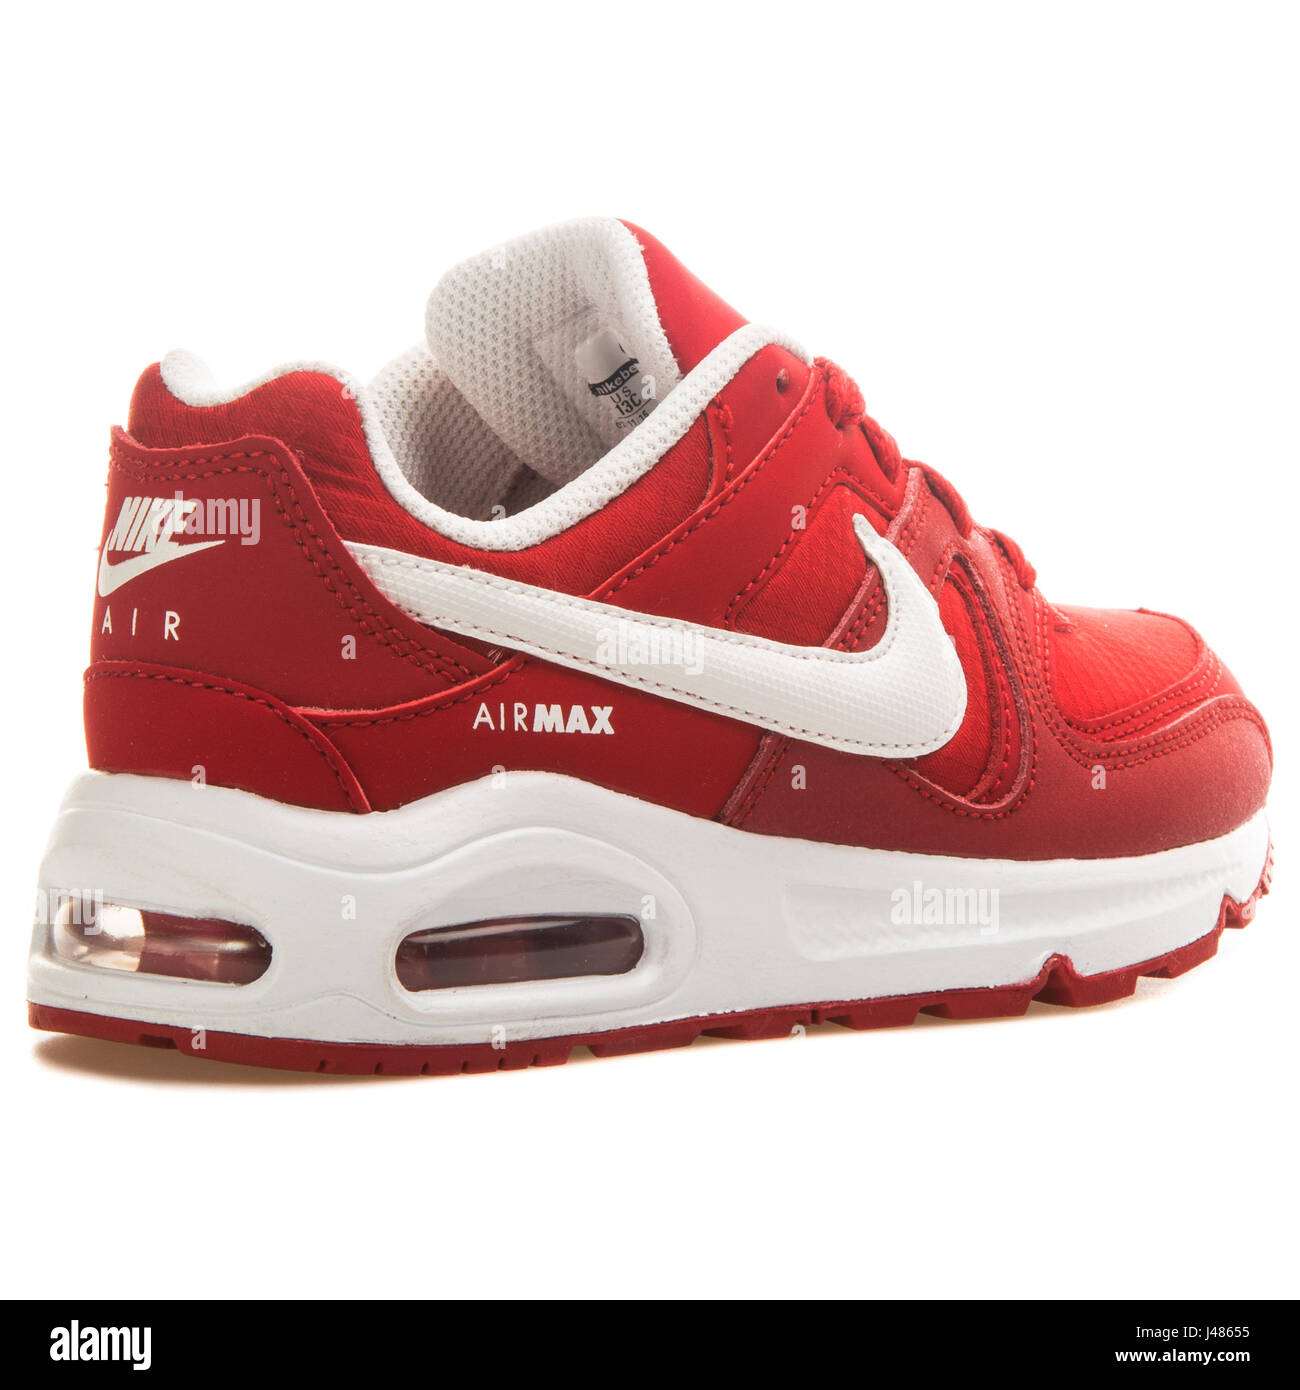 Nike Historique Des Commandes Air Max De Uss